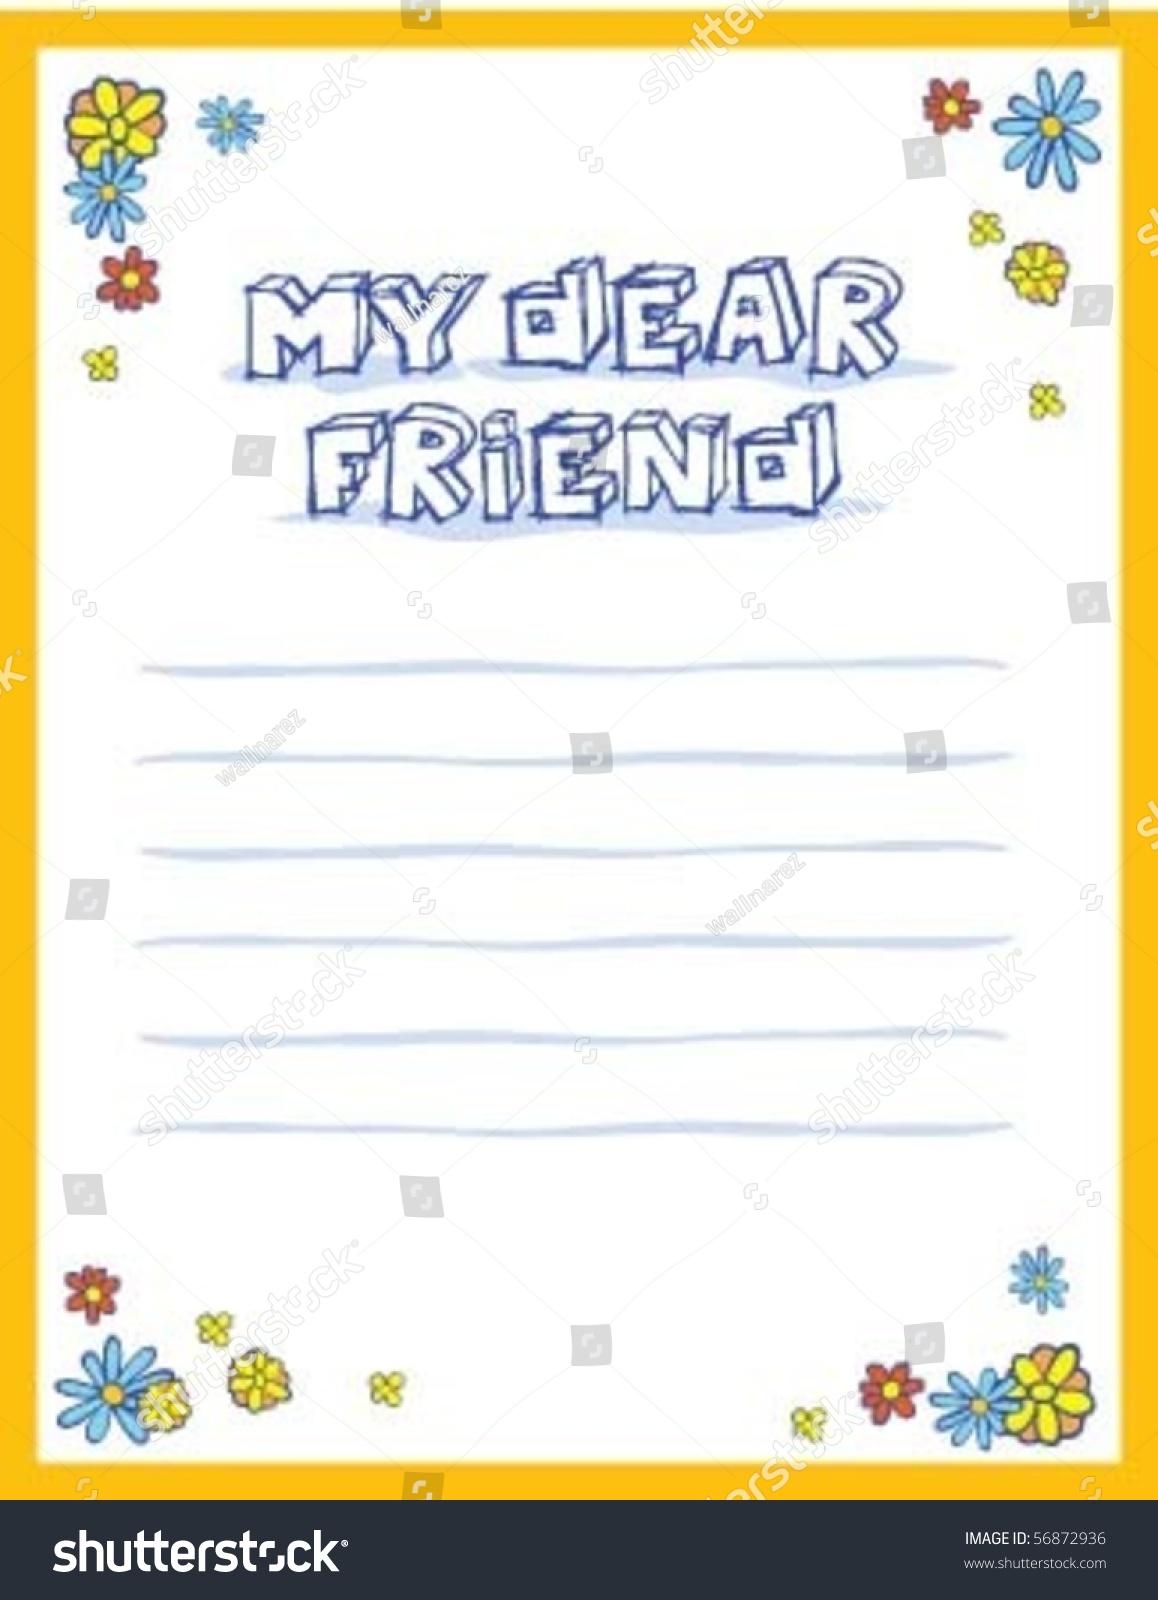 Congratulation letter friend stock photo photo vector congratulation letter for friend thecheapjerseys Gallery